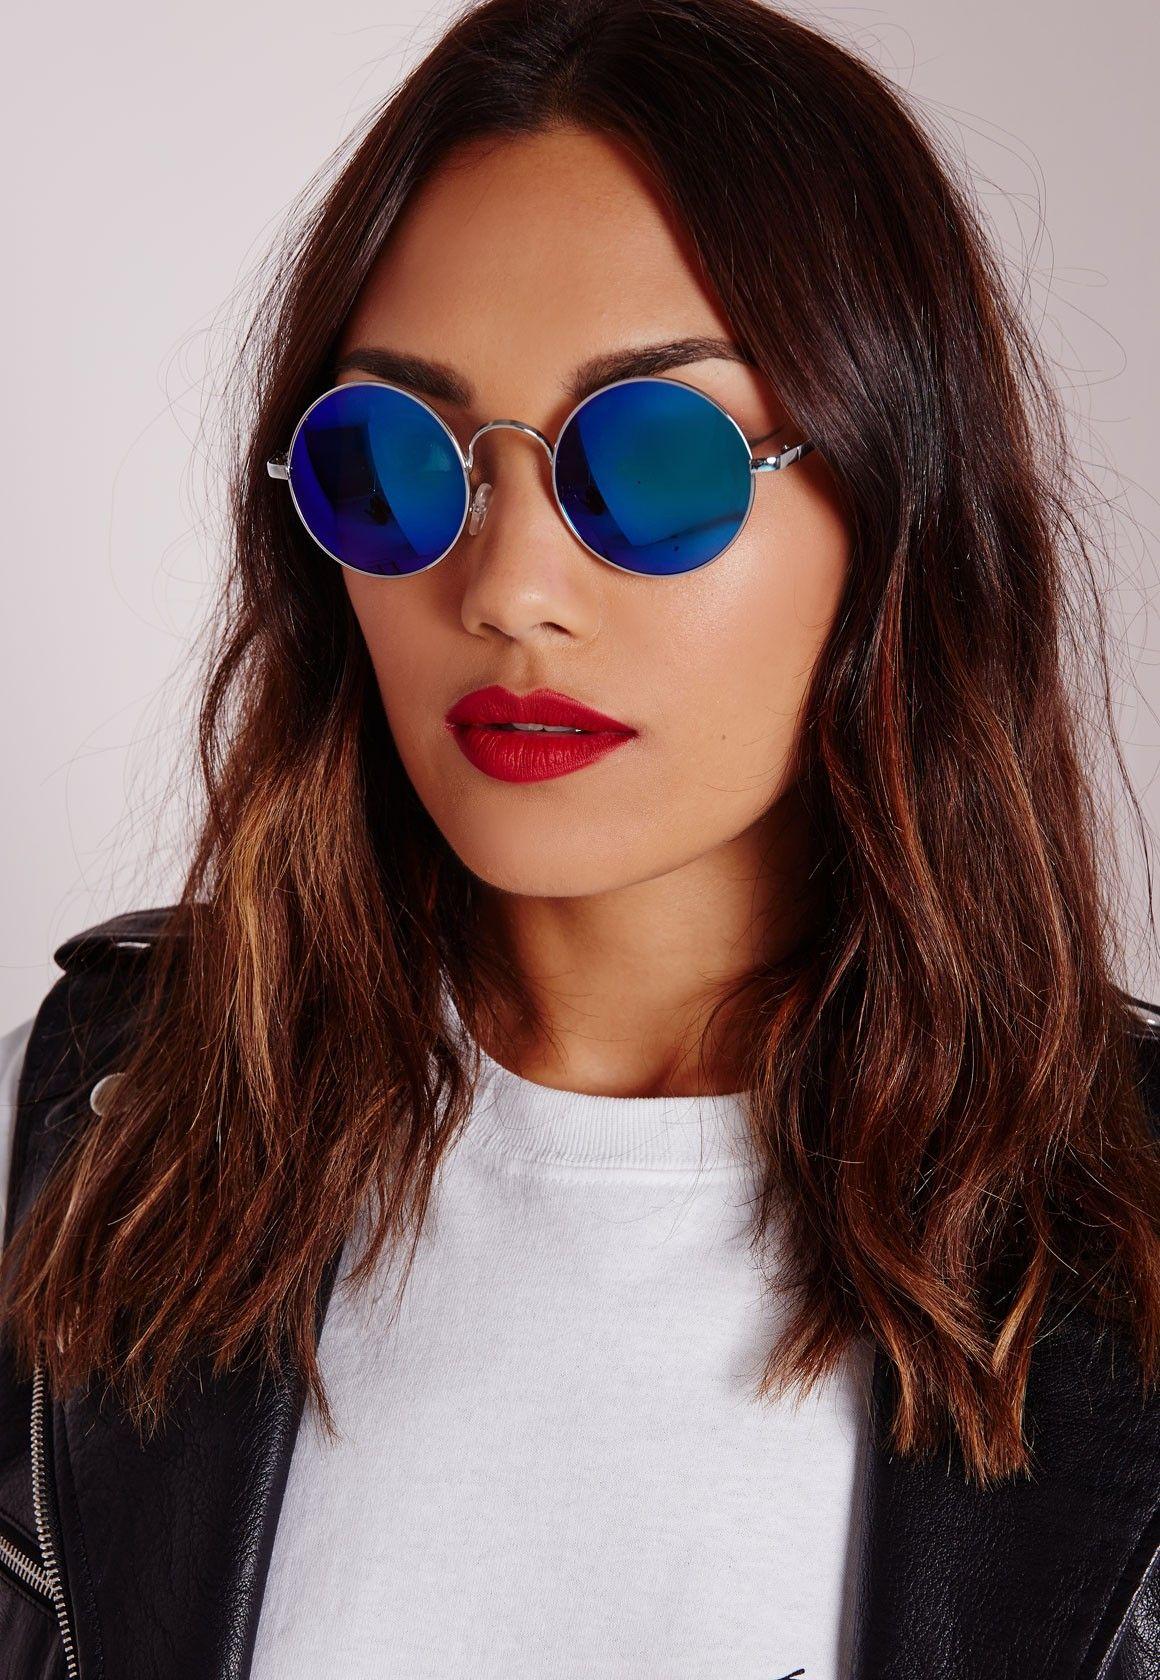 Silver Frame Round Mirrored Sunglasses Blue - Accessories - Sunglasses -  Missguided 2e162d21d1e